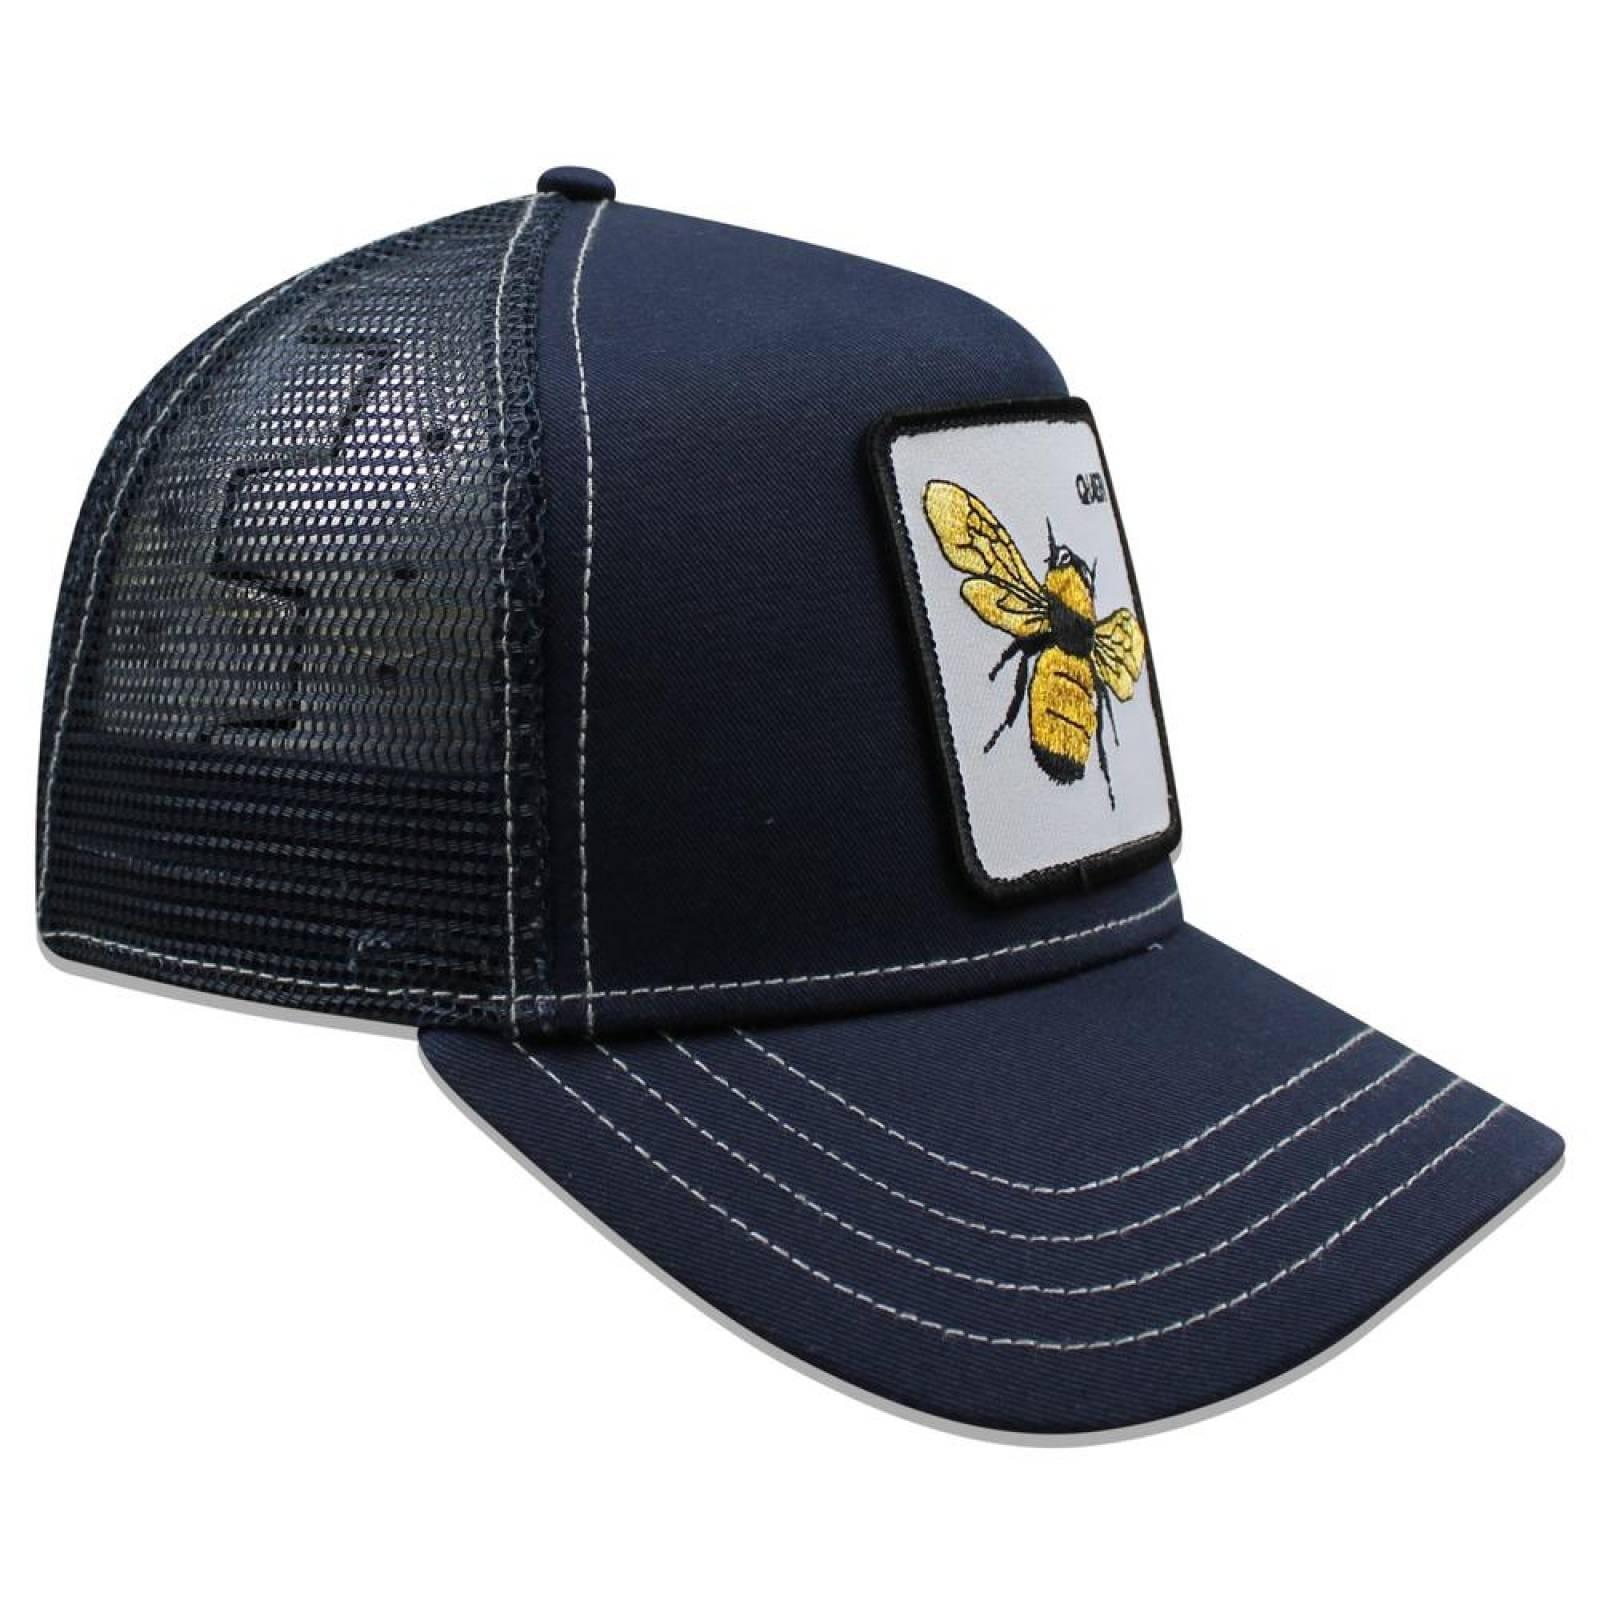 Gorra Goorin Bros Trucker Fierce Abeja 1010567 Azul Marino